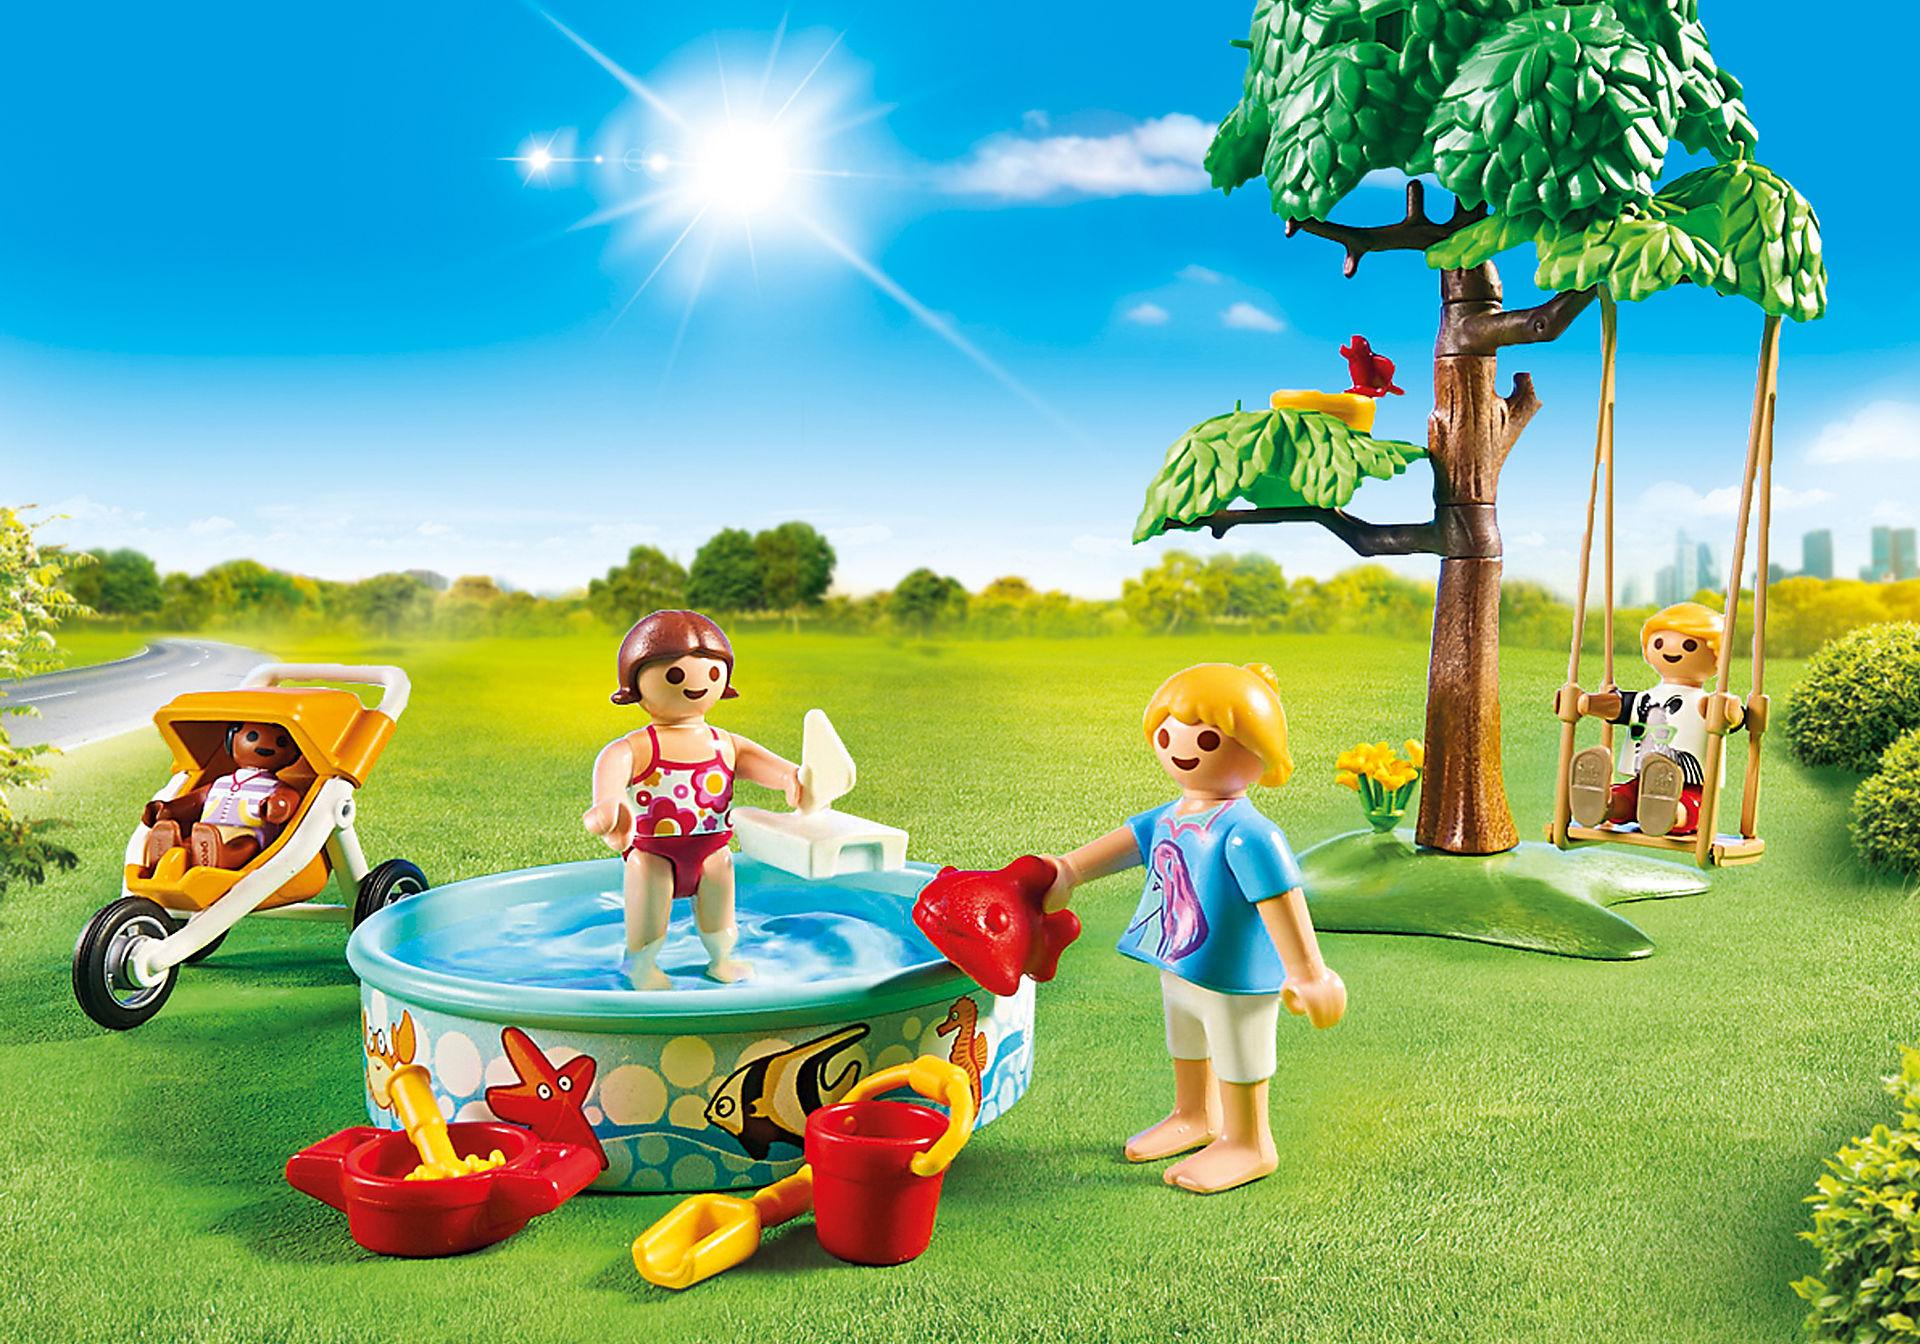 http://media.playmobil.com/i/playmobil/9272_product_extra1/Housewarming Party